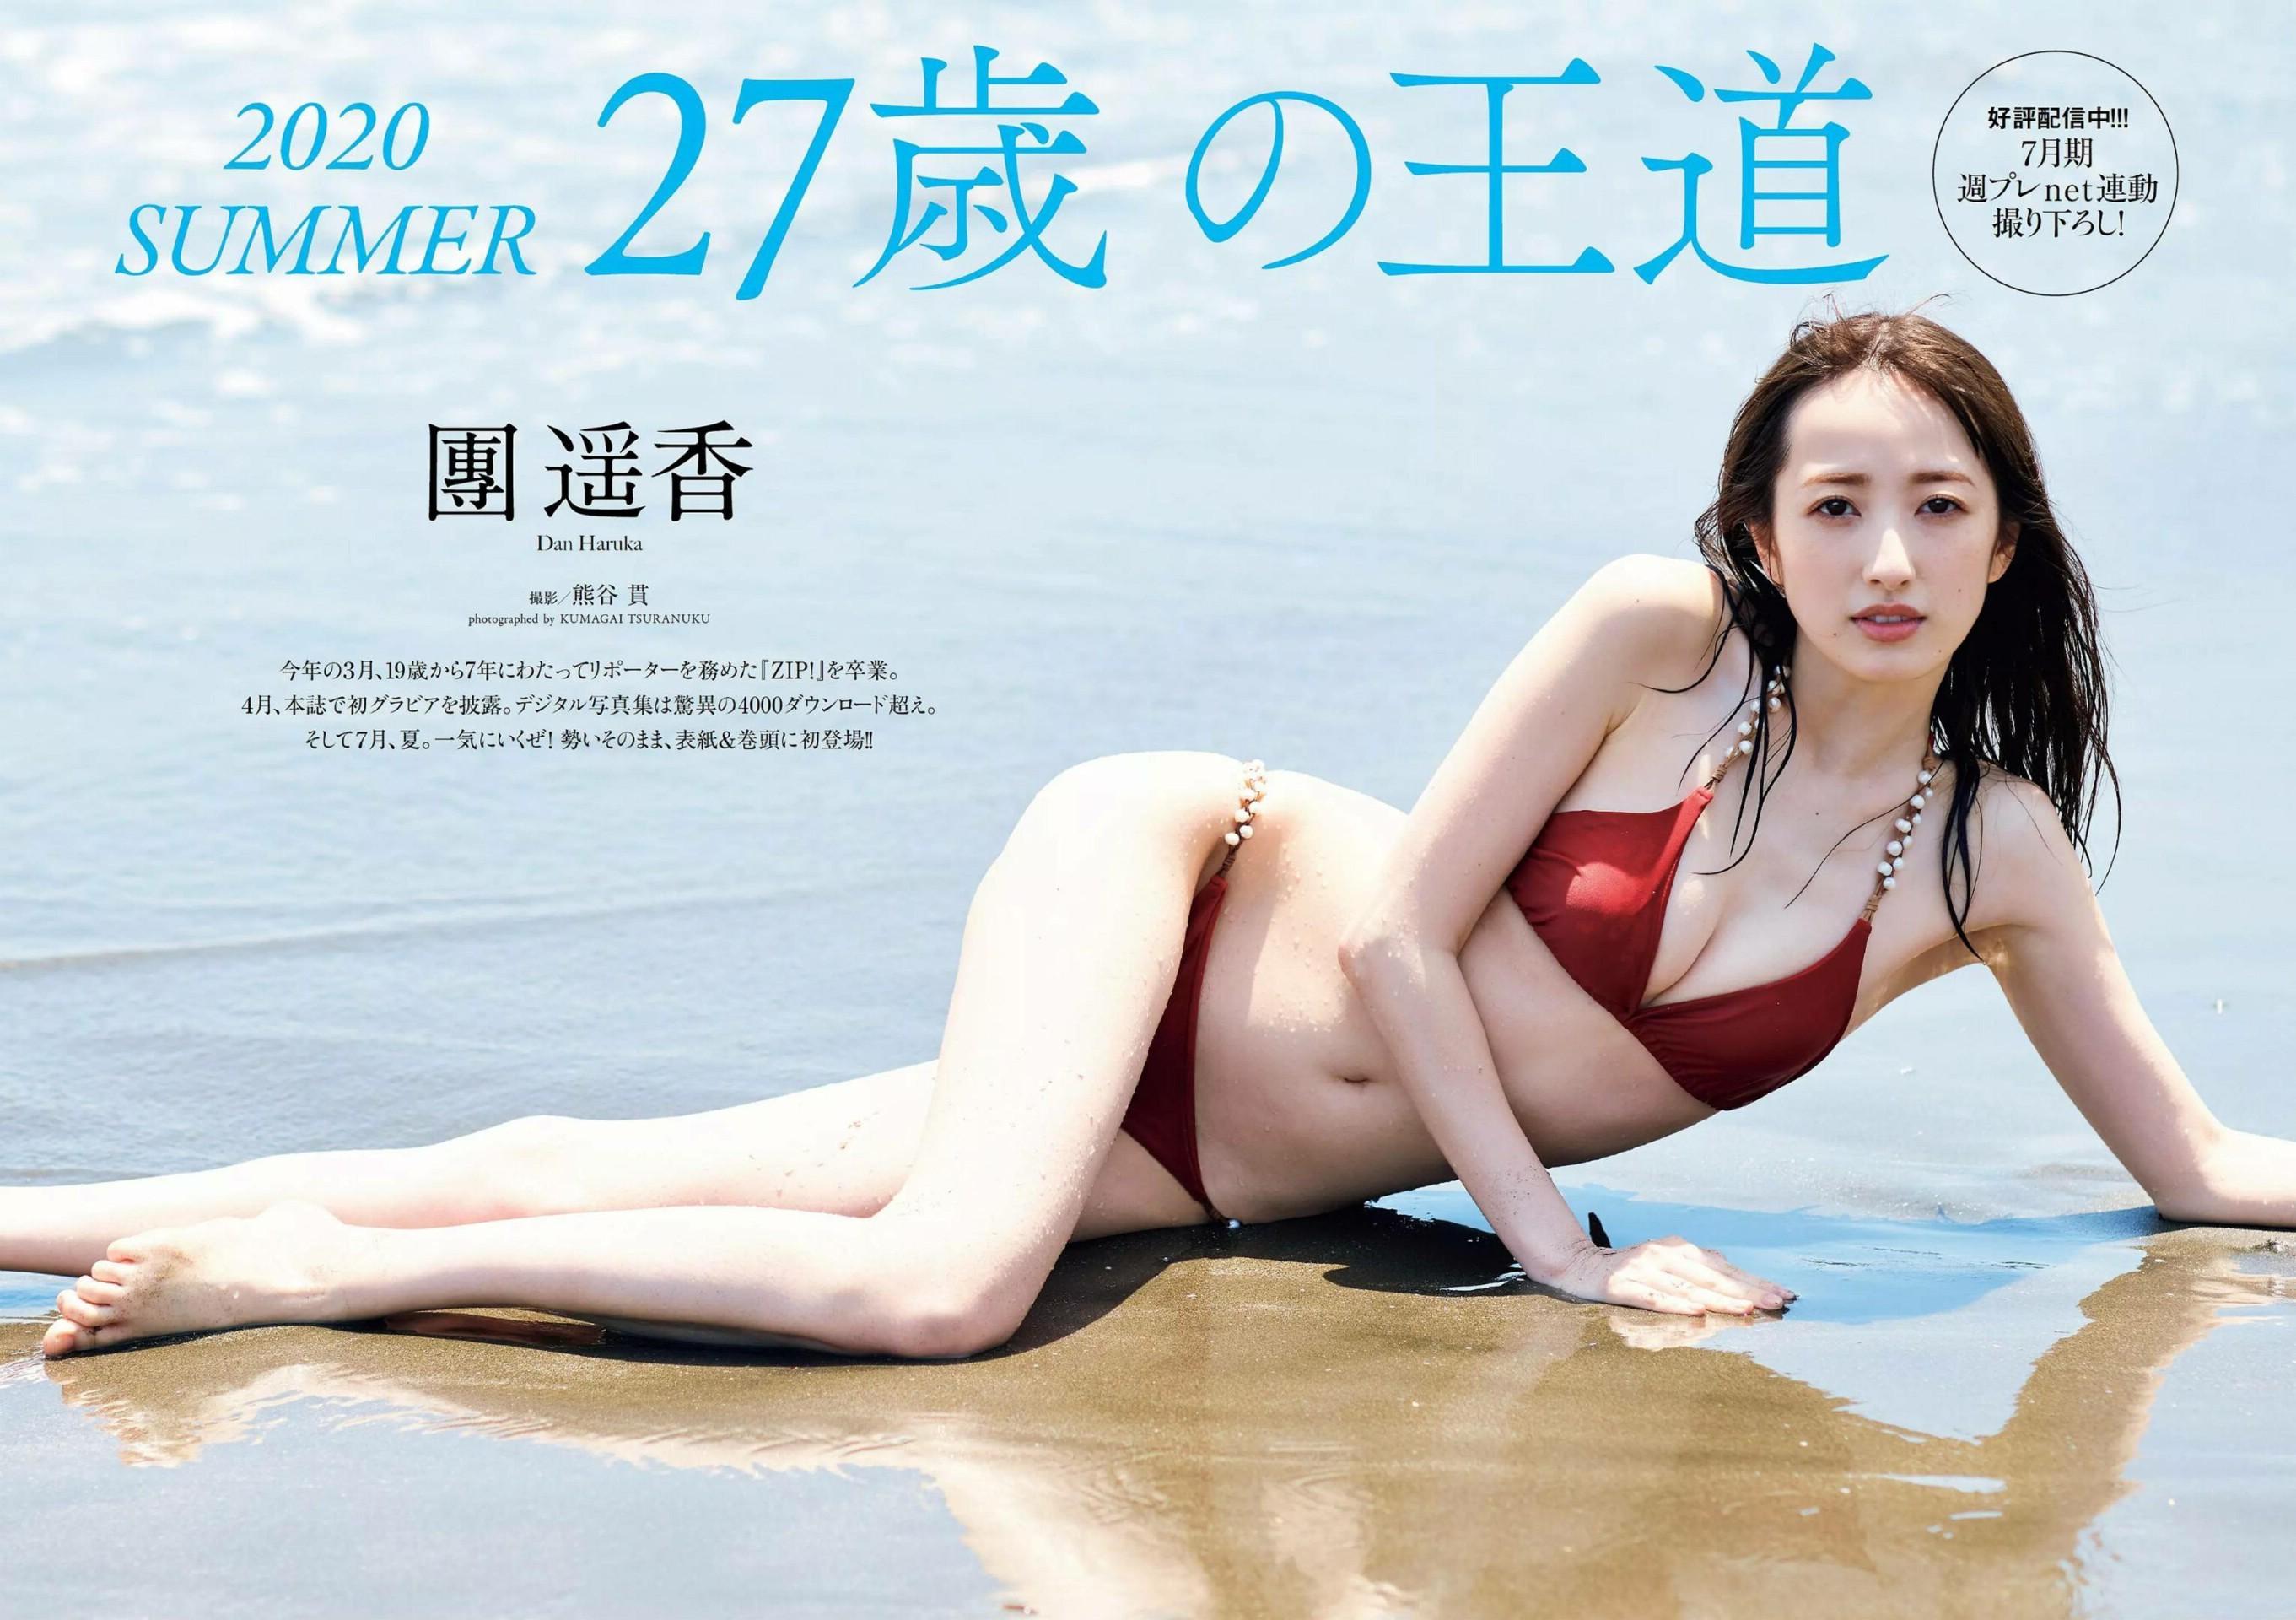 Weekly Playboy No.5